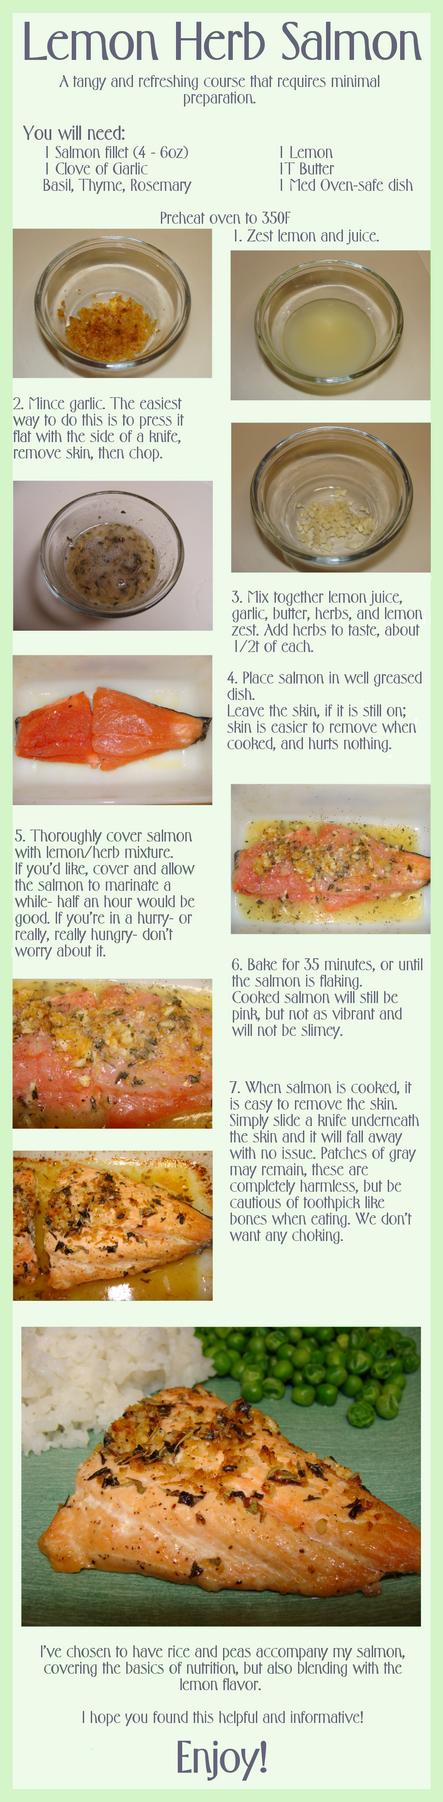 Lemon Herb Salmon by ElwynAvalon